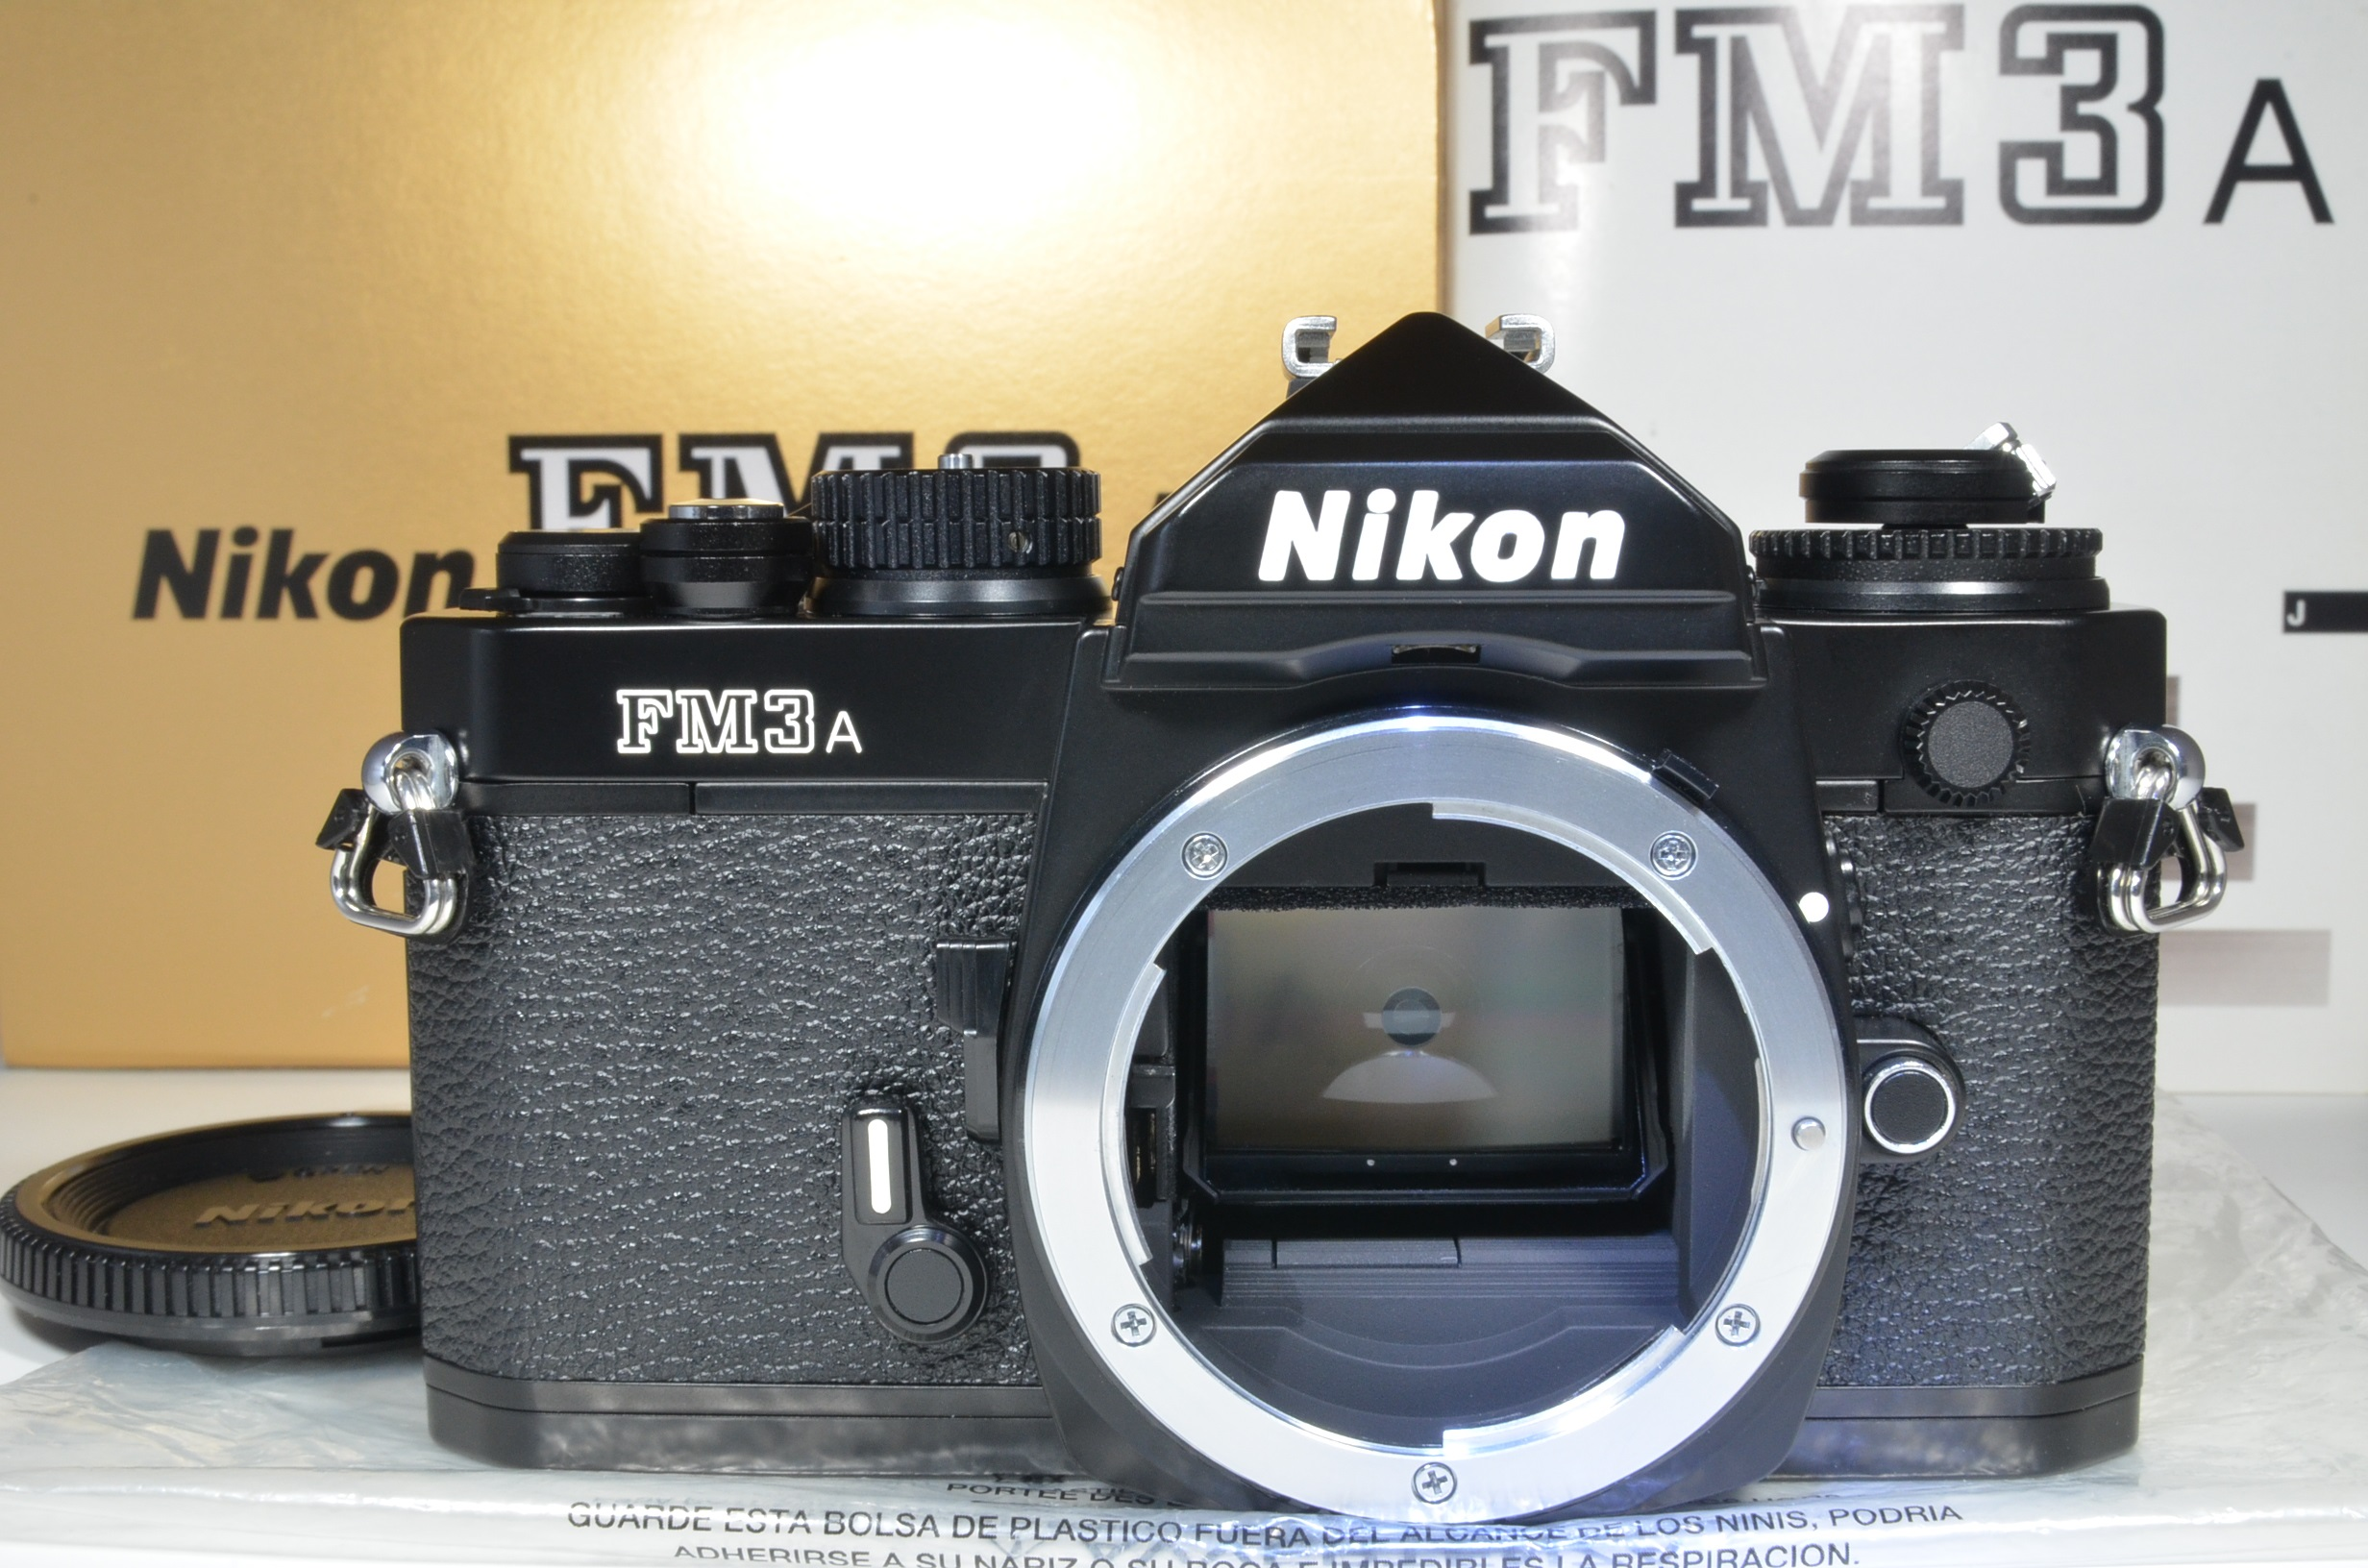 nikon fm3a 35mm film camera black   unused  very rare!